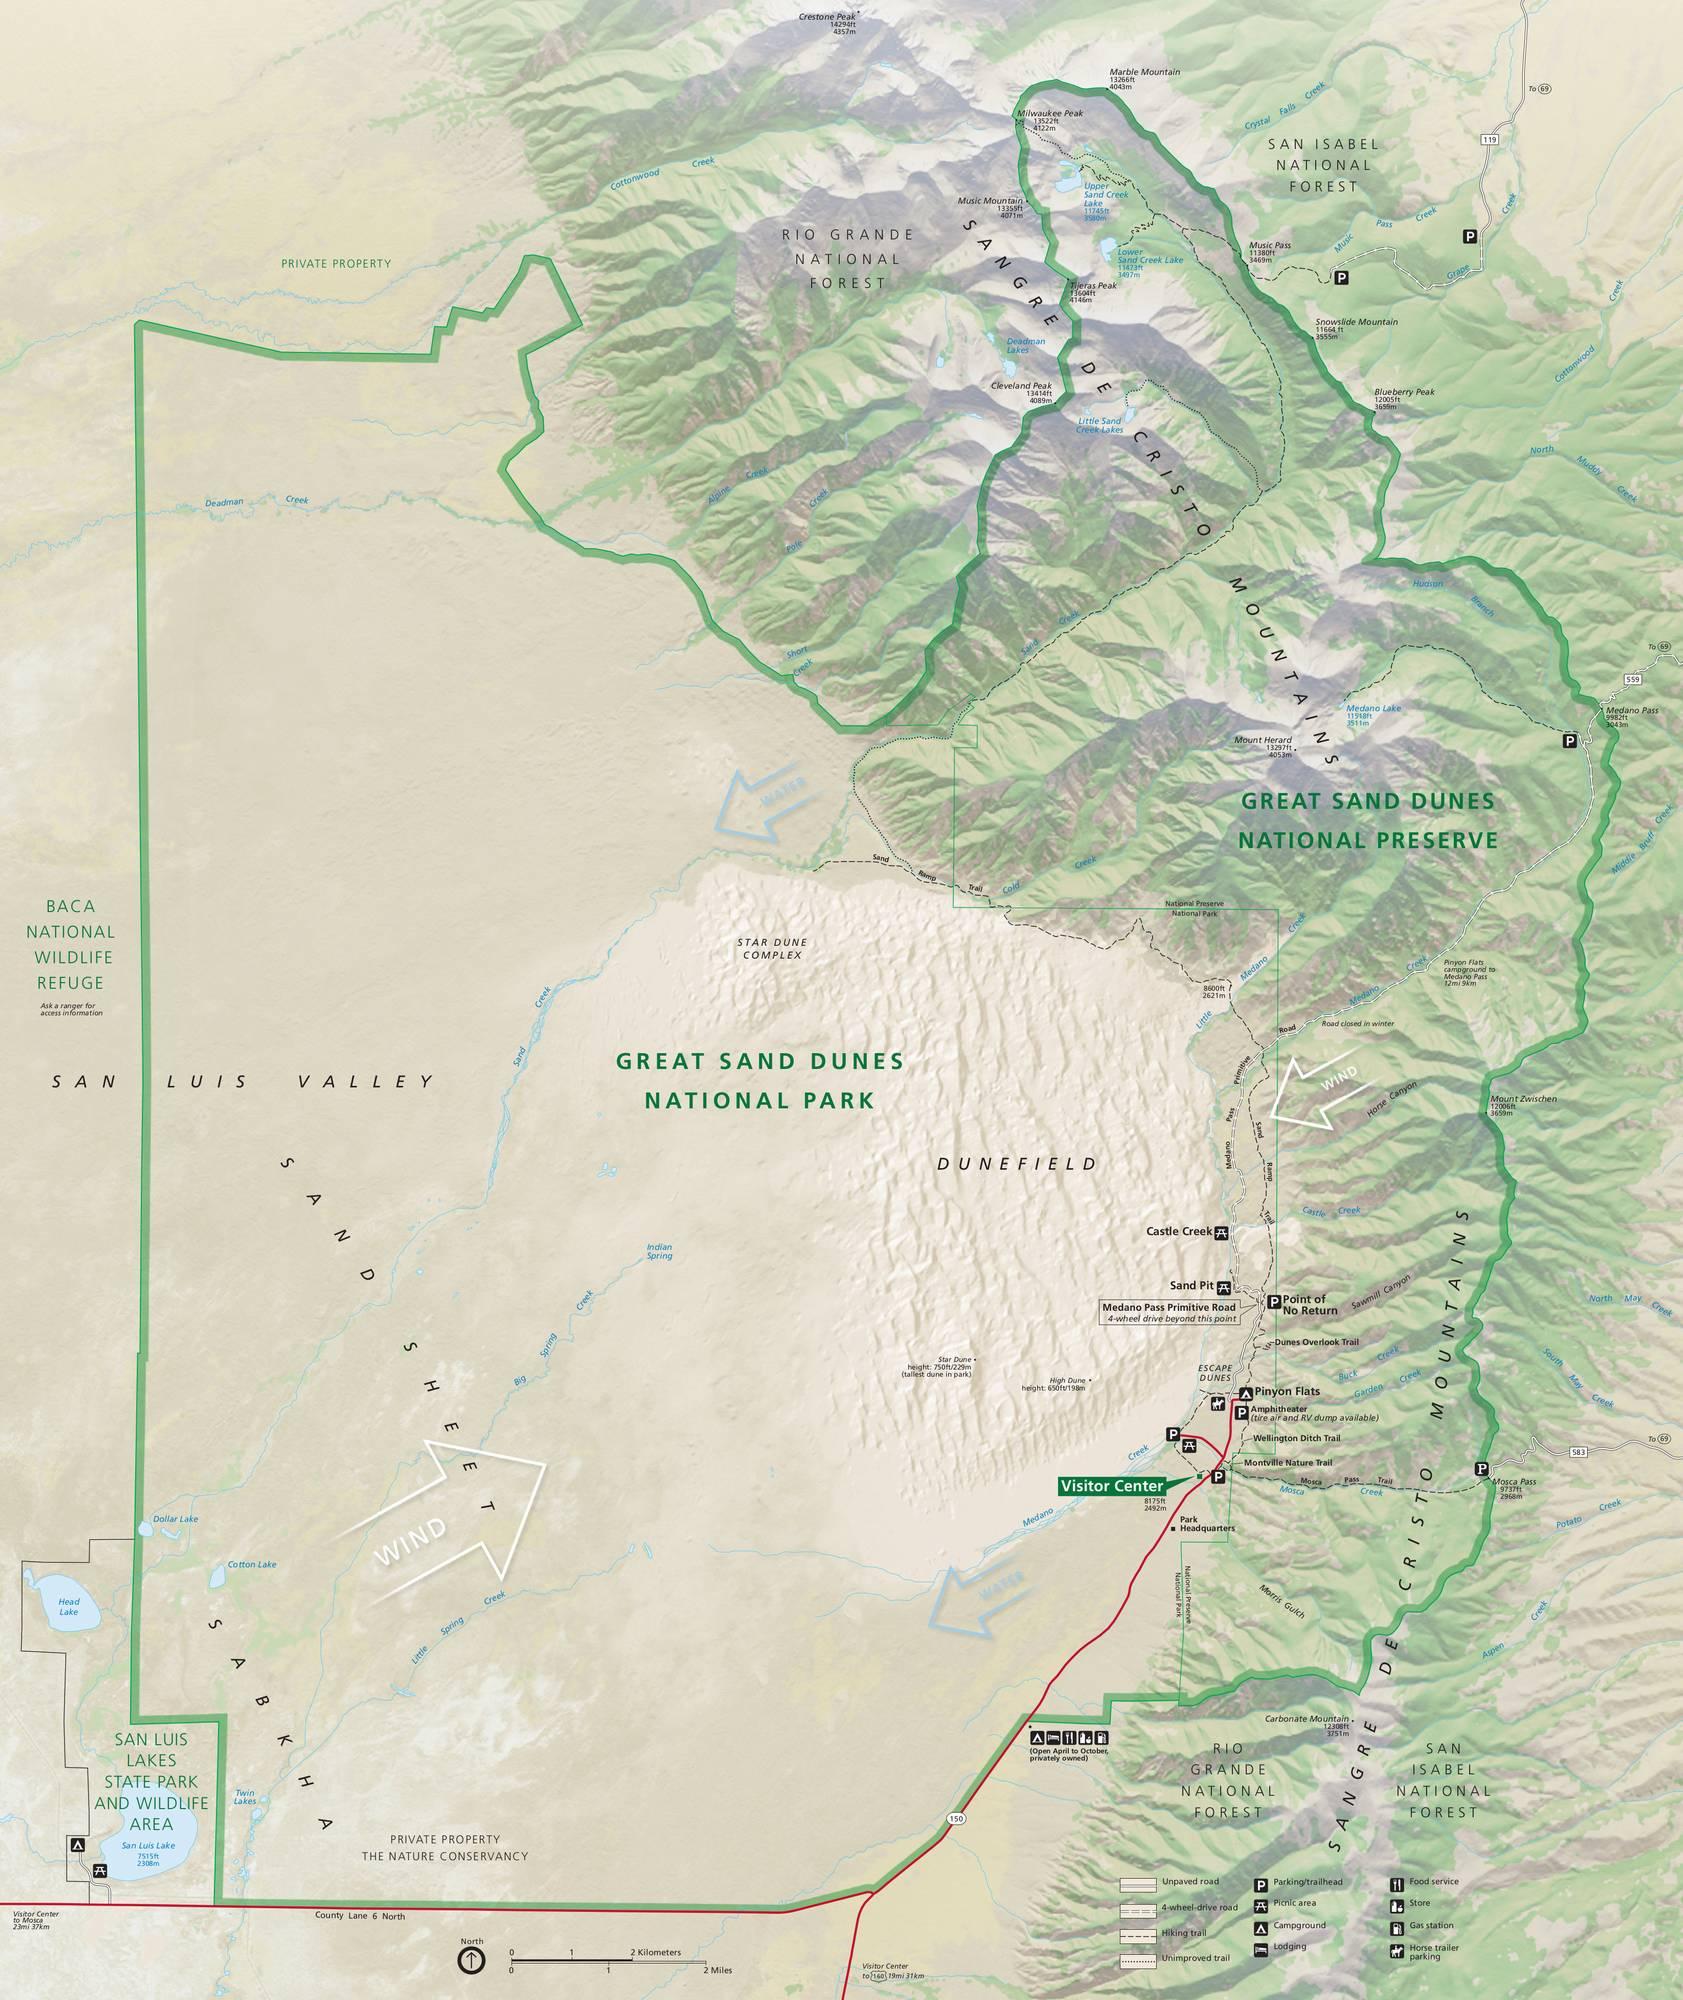 Карта парка Грейт Сэнд Дьюнс